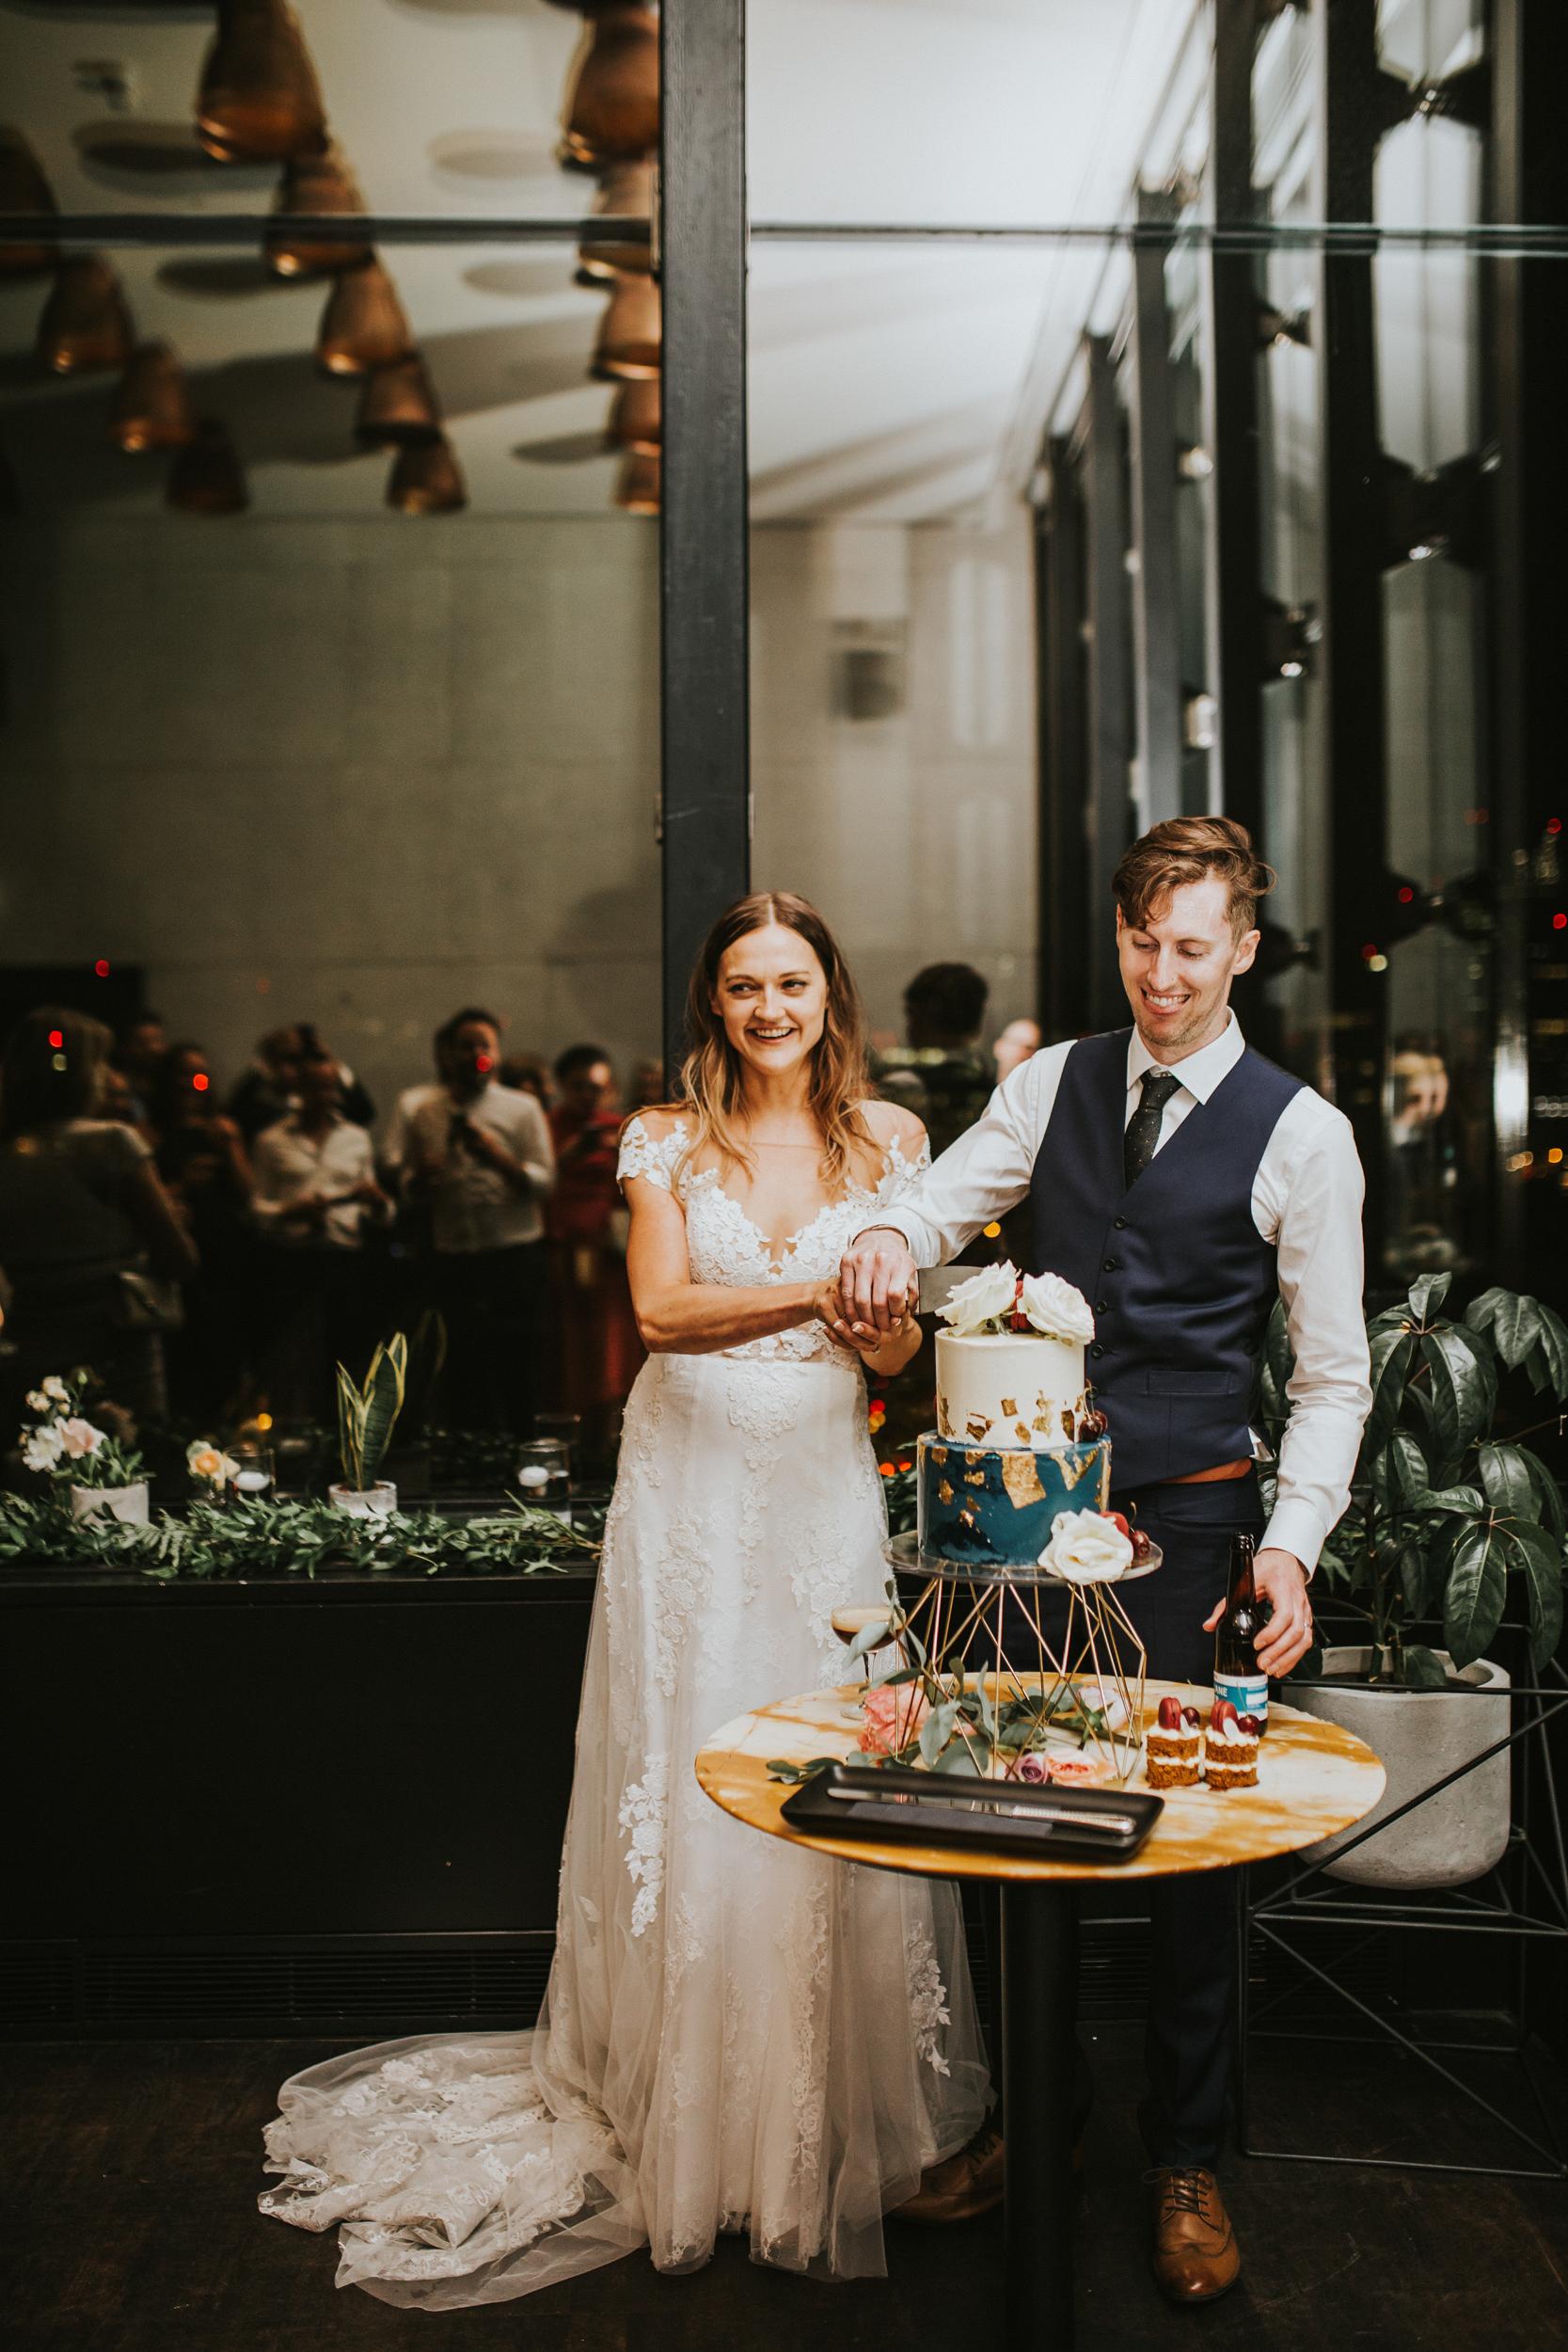 Laura-Benn-The-Asylum-London-The-Ace-Hotel-Wedding-Alternative-Darina-Stoda-Photography-849.jpg